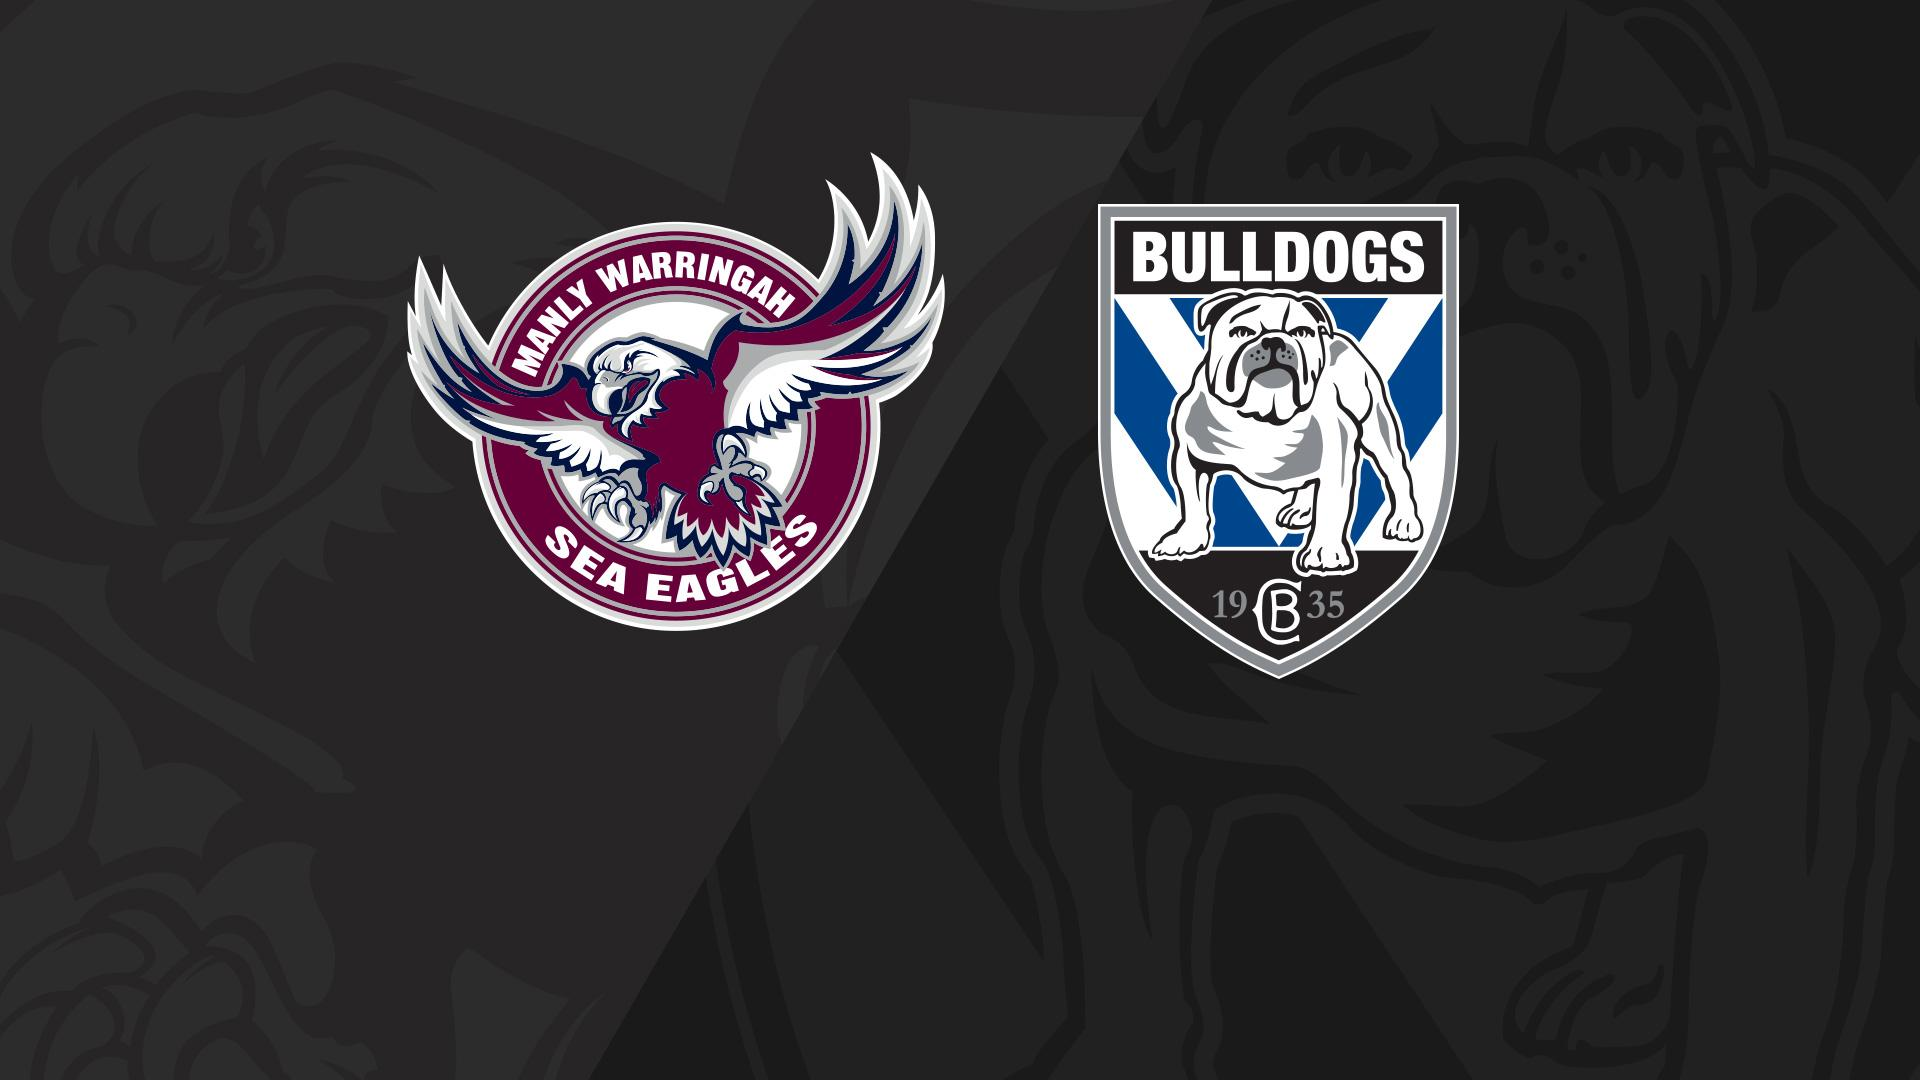 Full Match Replay: Sea Eagles v Bulldogs - Round 22, 2018